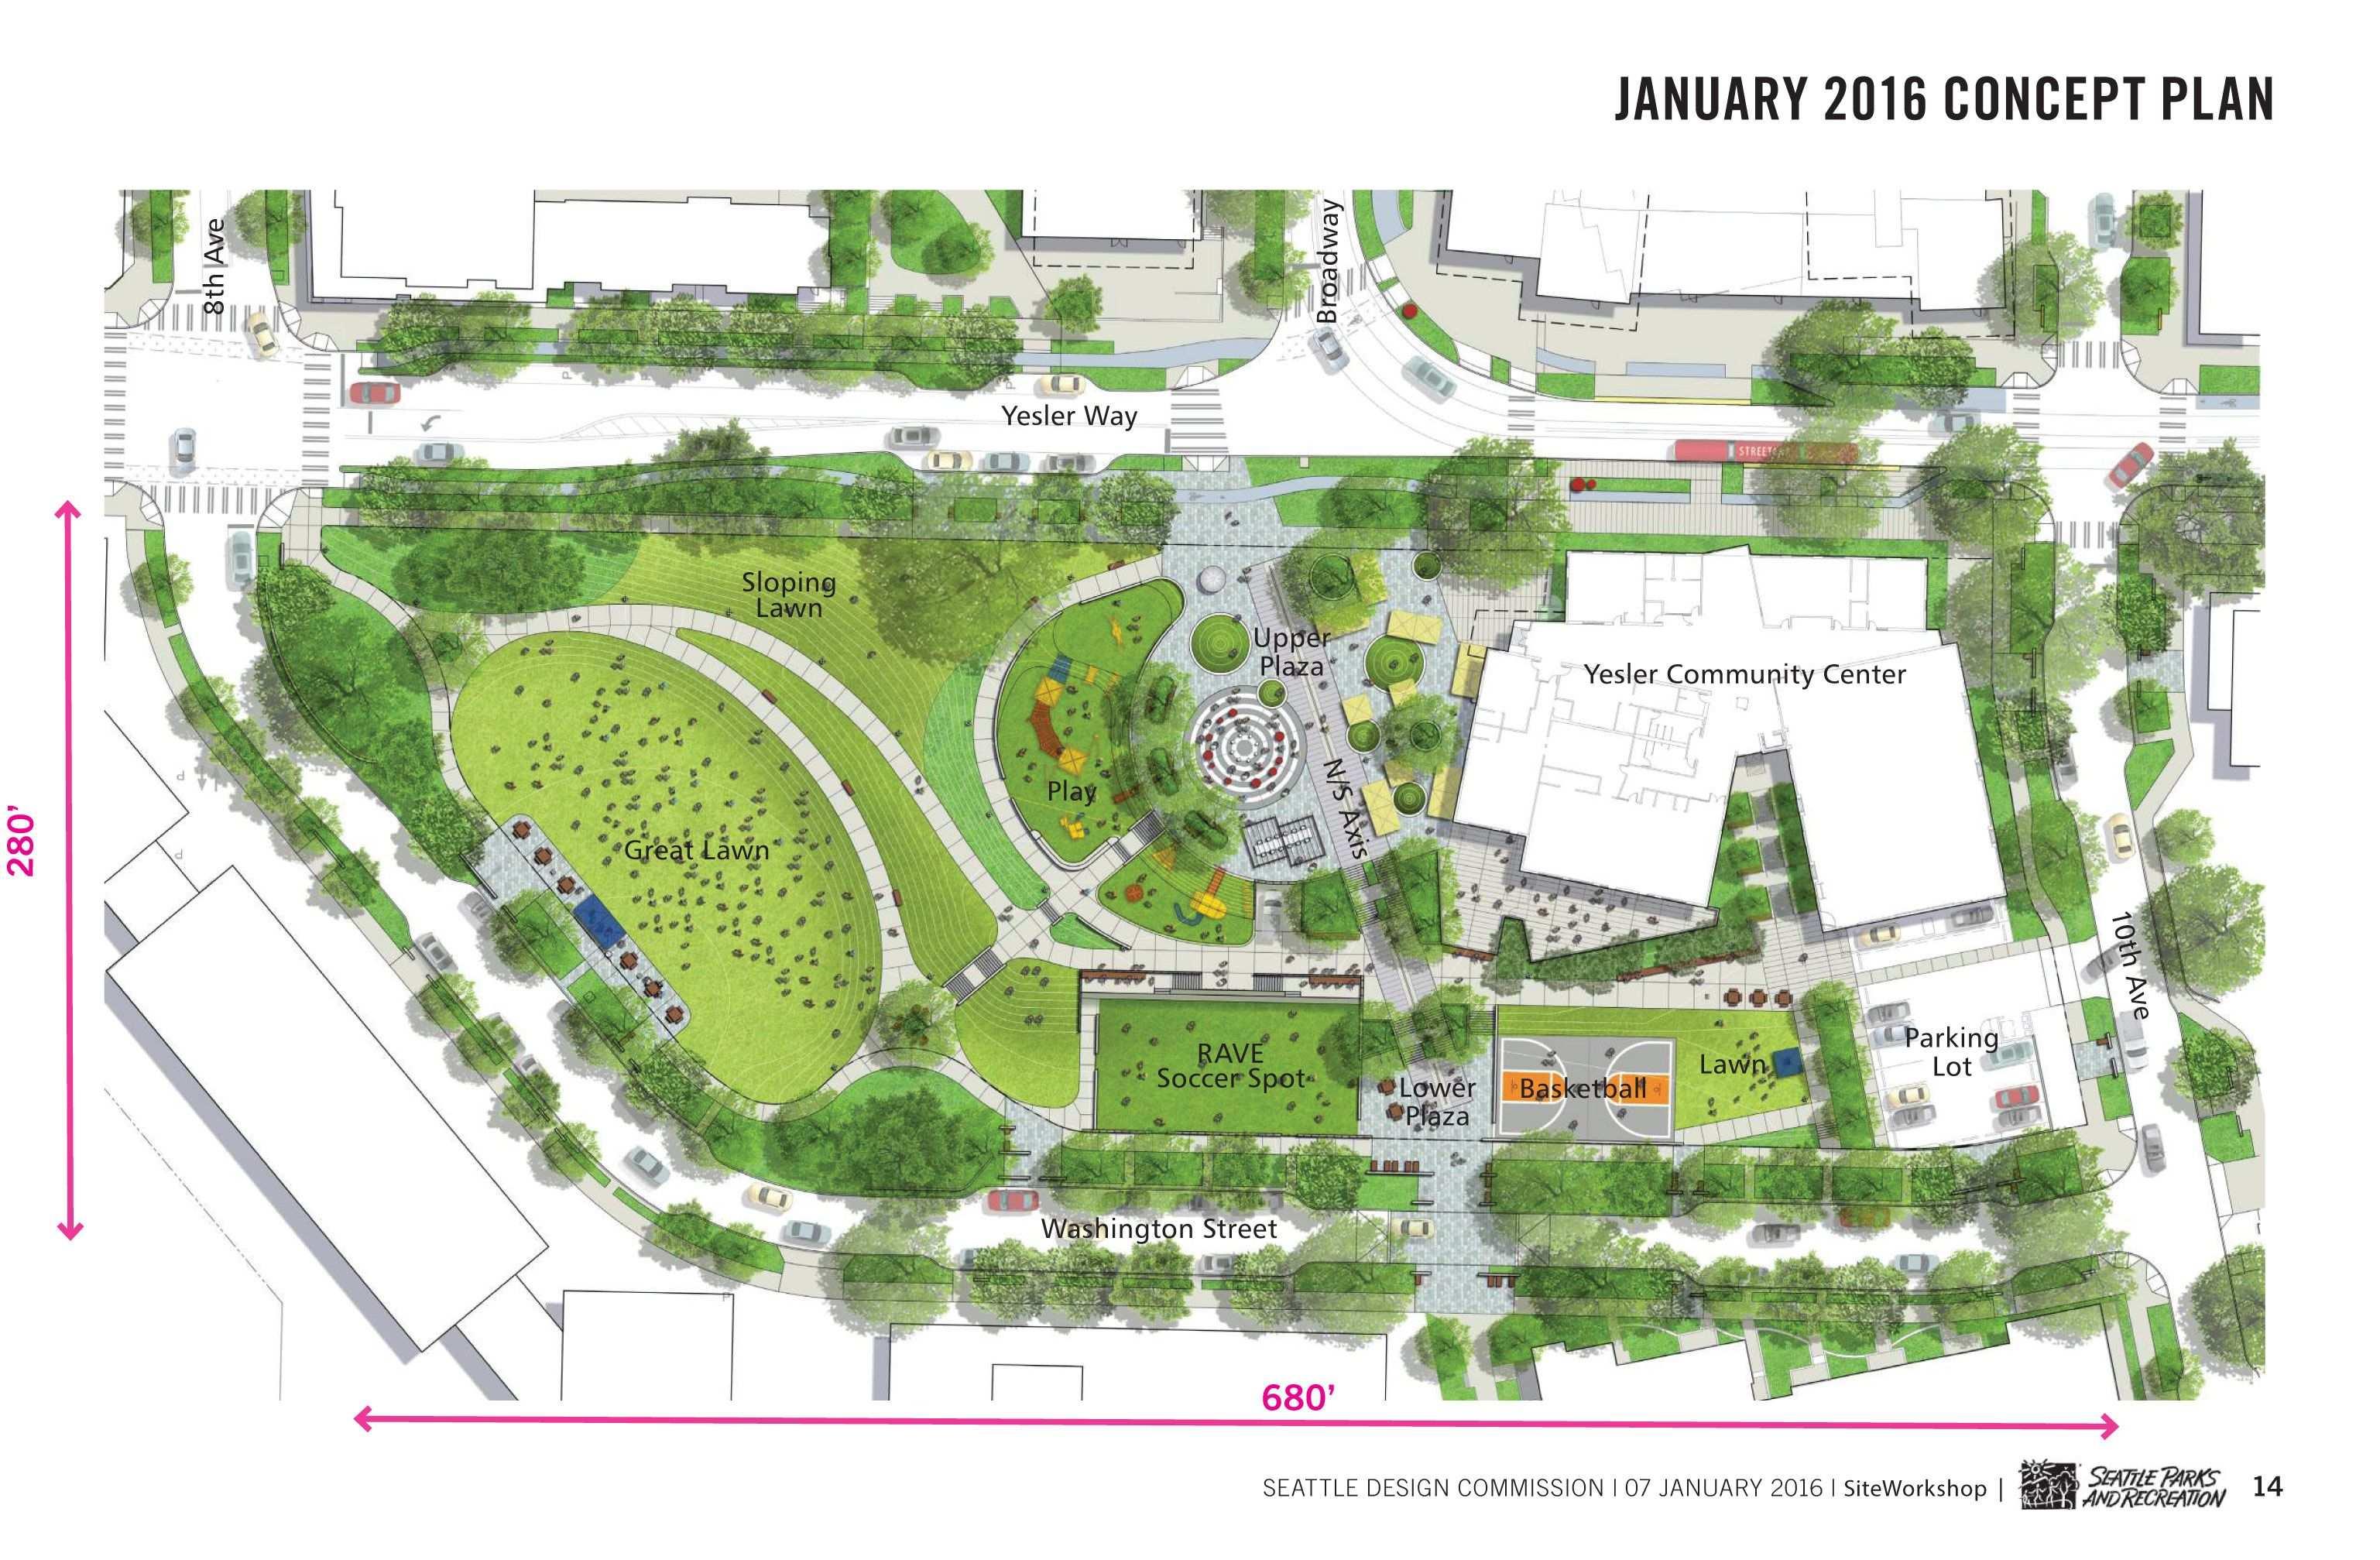 Yesler Site Plan Landscape Architecture Plan Parking Design